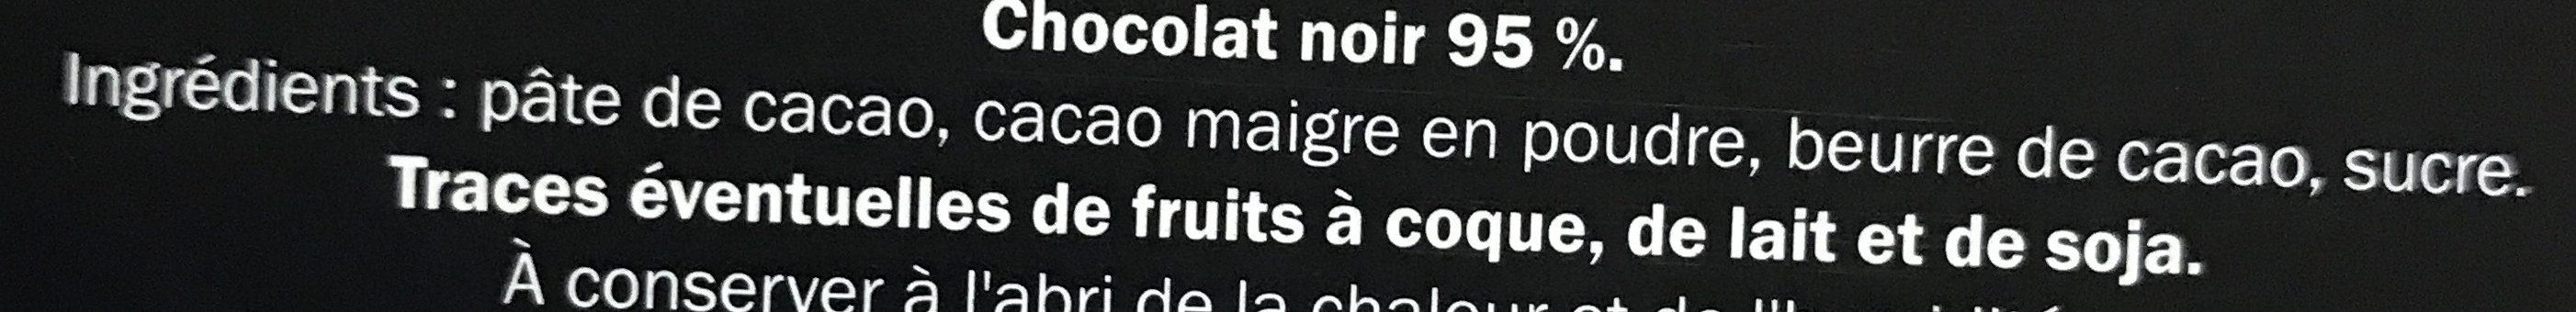 Chocolat noir Ecuador 95% cacao - Ingredientes